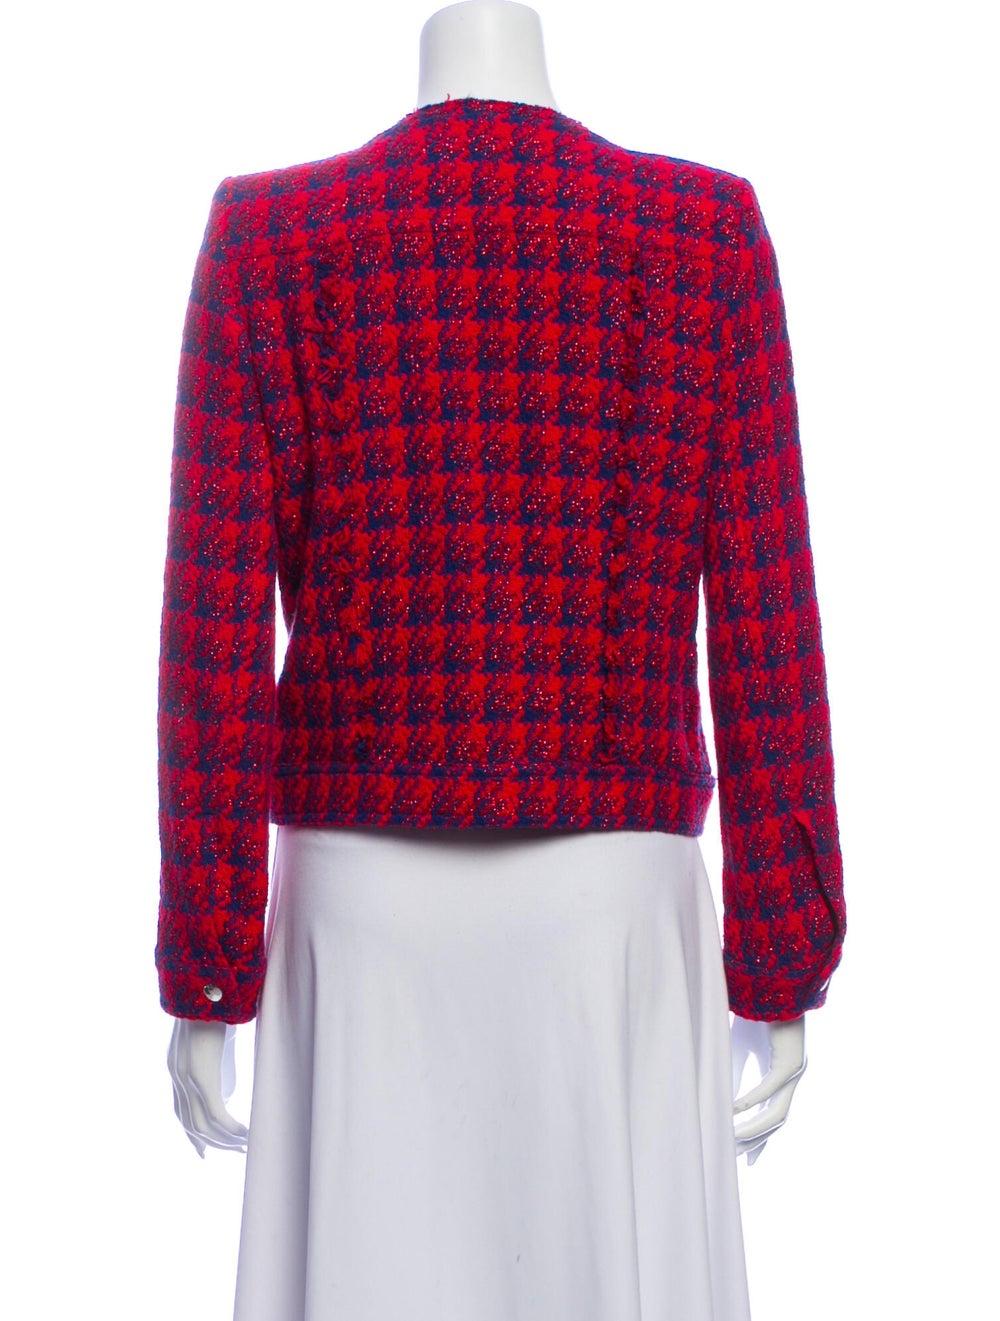 Iro Tweed Pattern Jacket - image 3